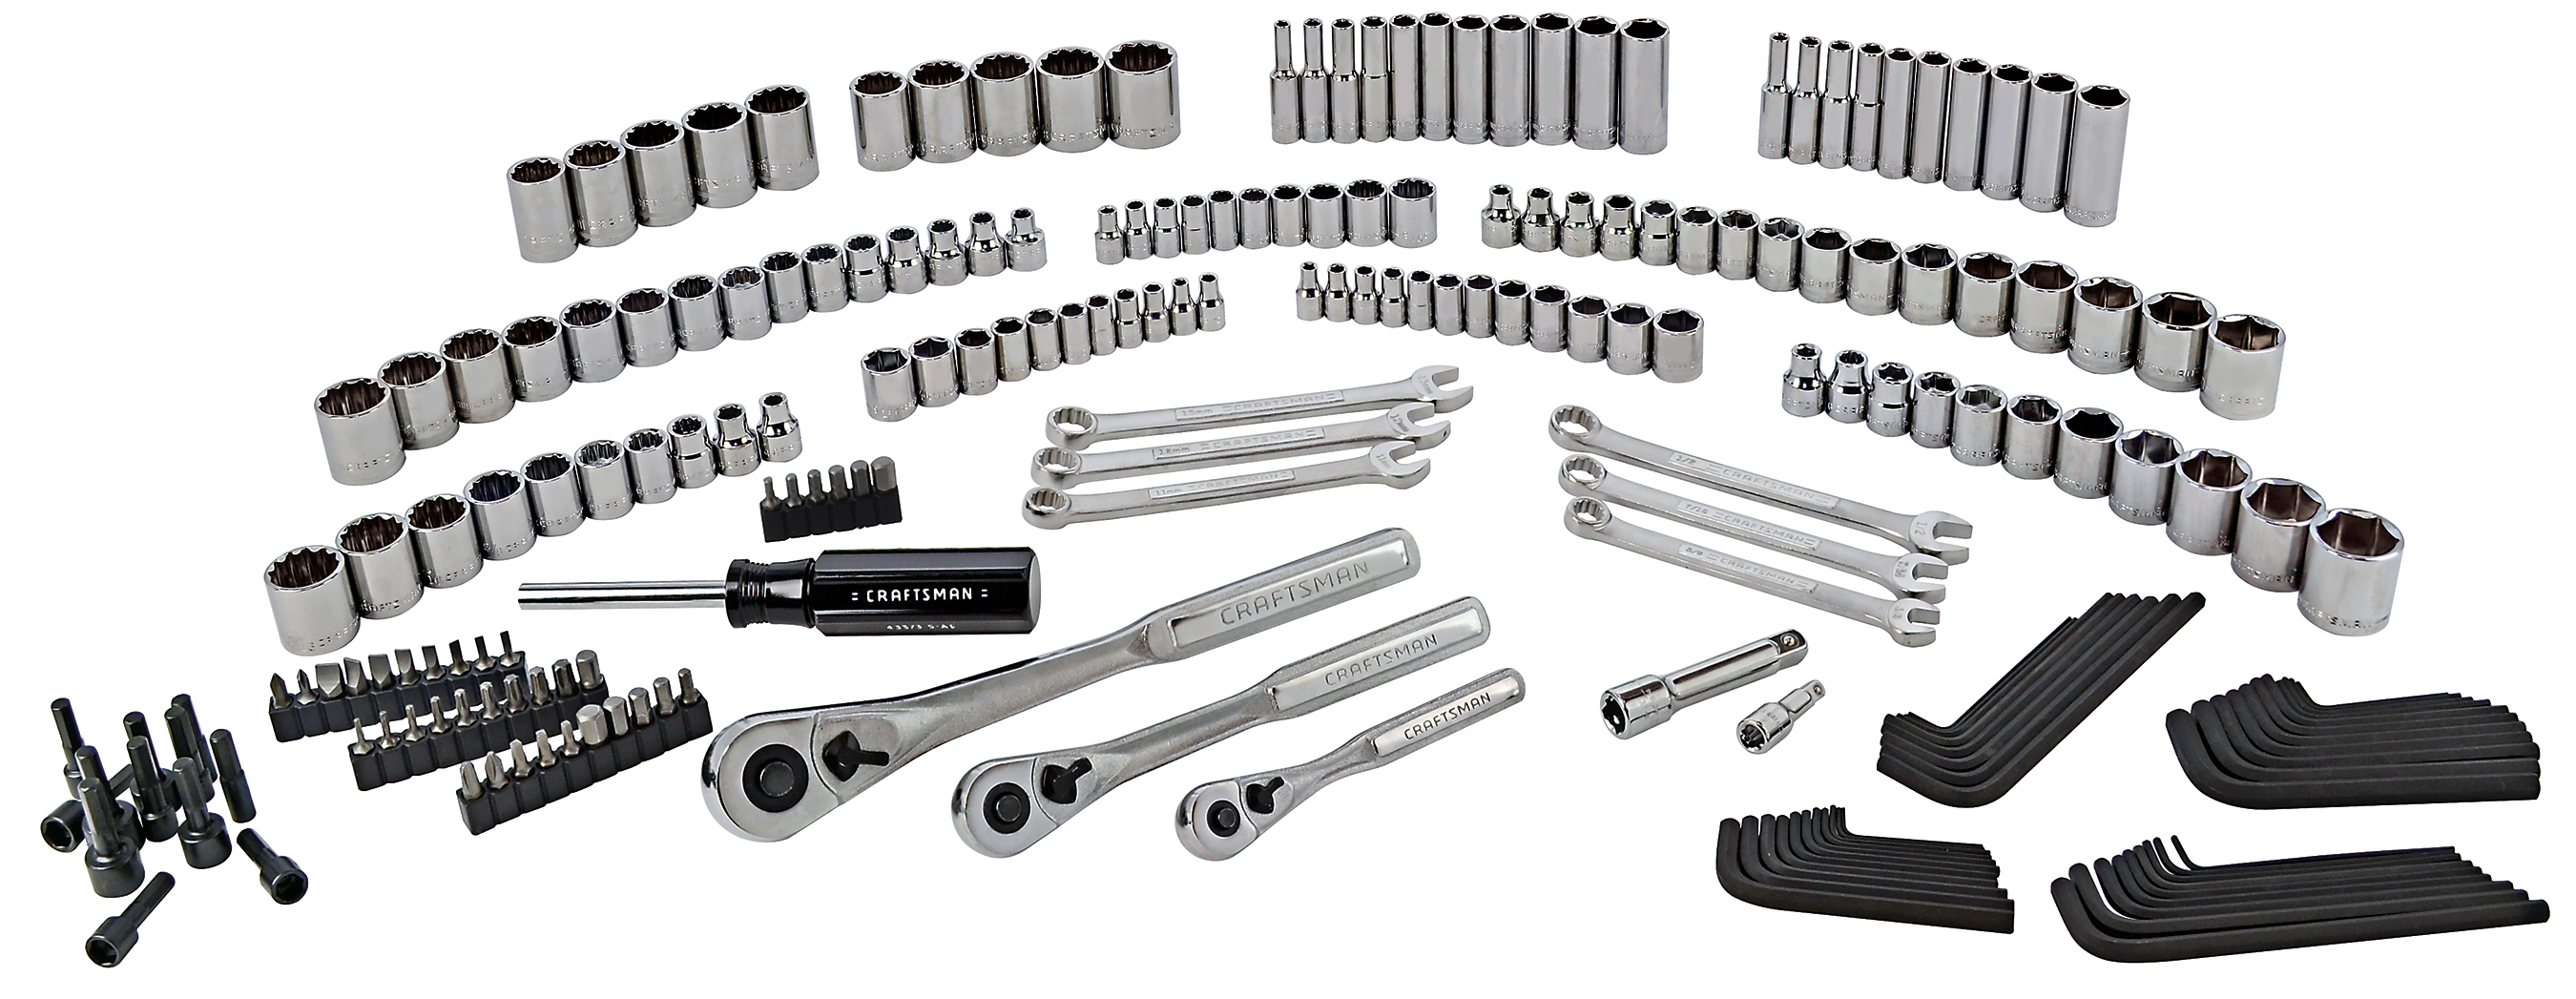 Craftsman 216pc Mechanics Tool Set